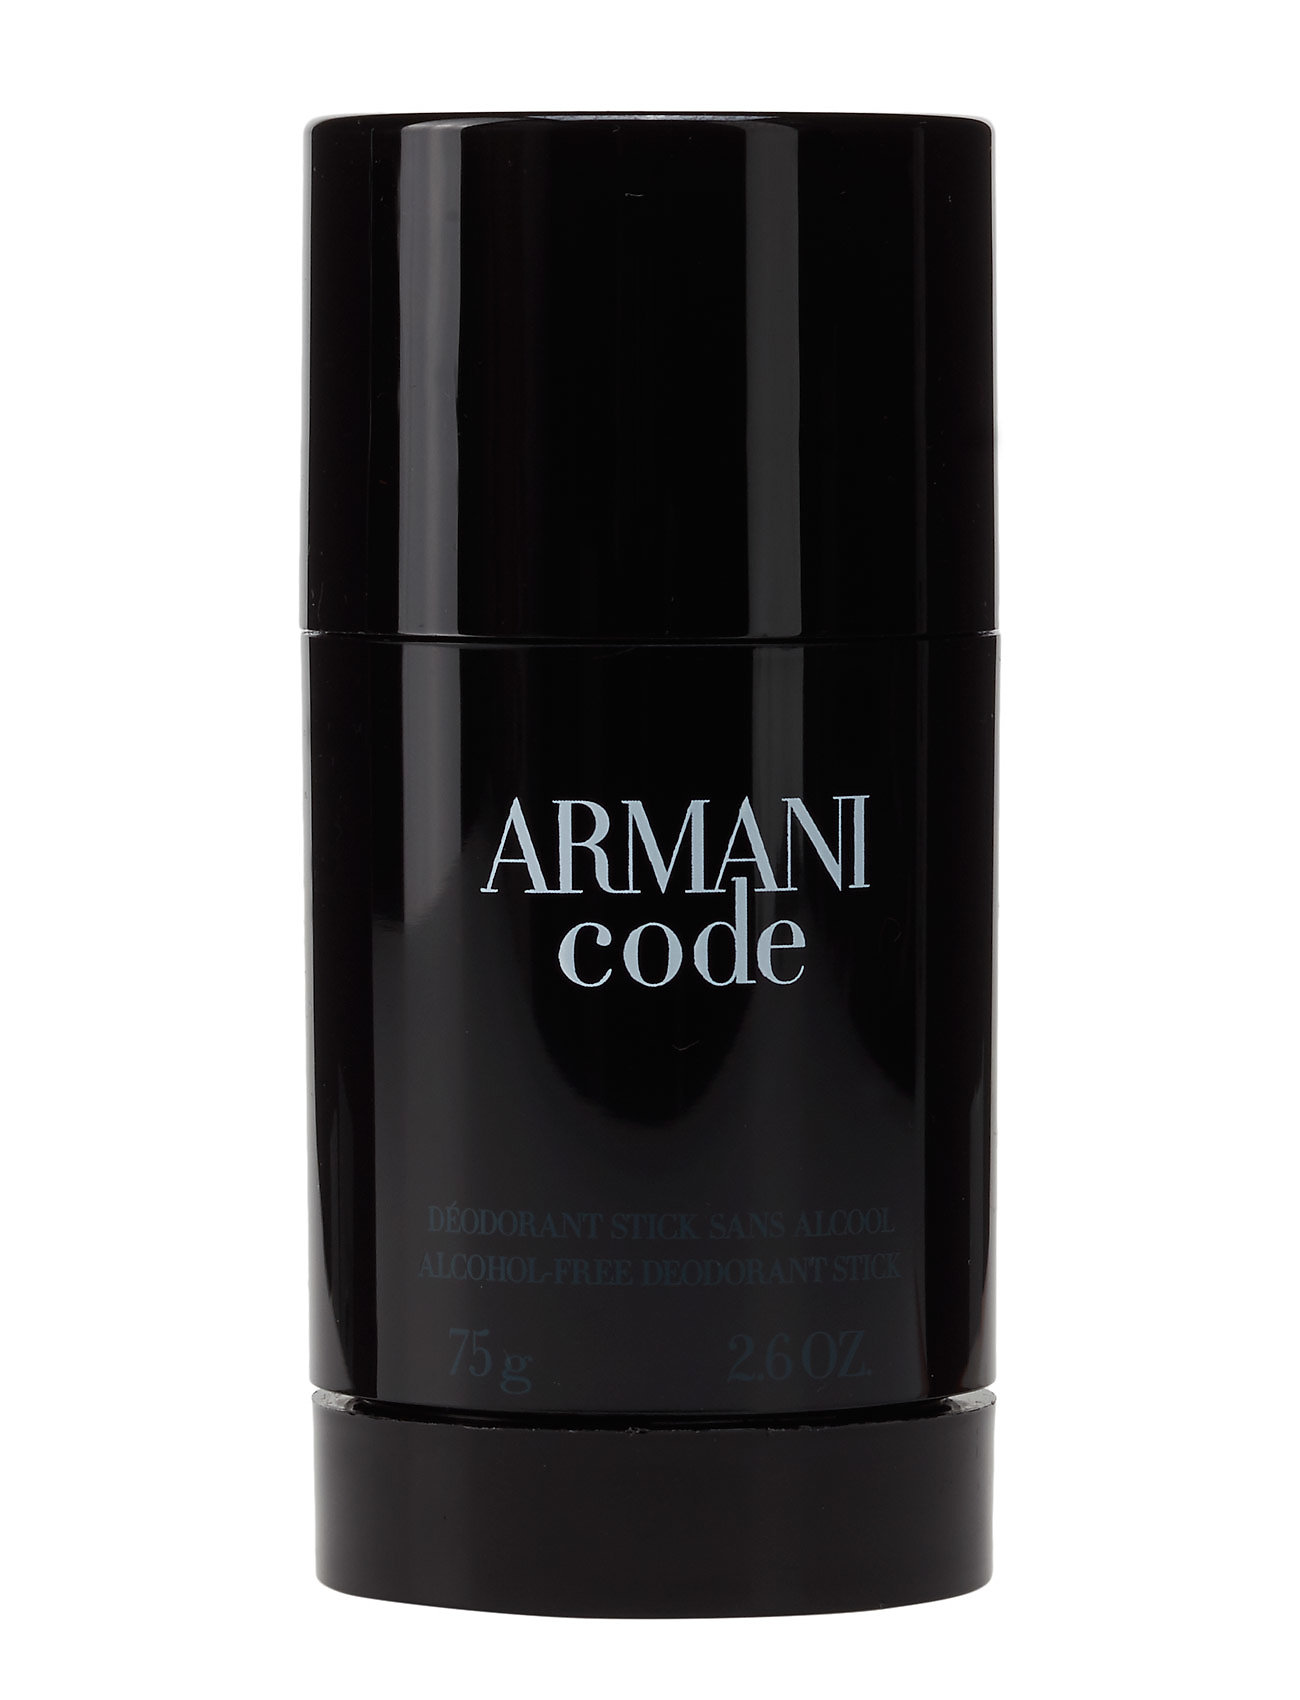 giorgio armani Armani code men deostick 75 ml på boozt.com dk